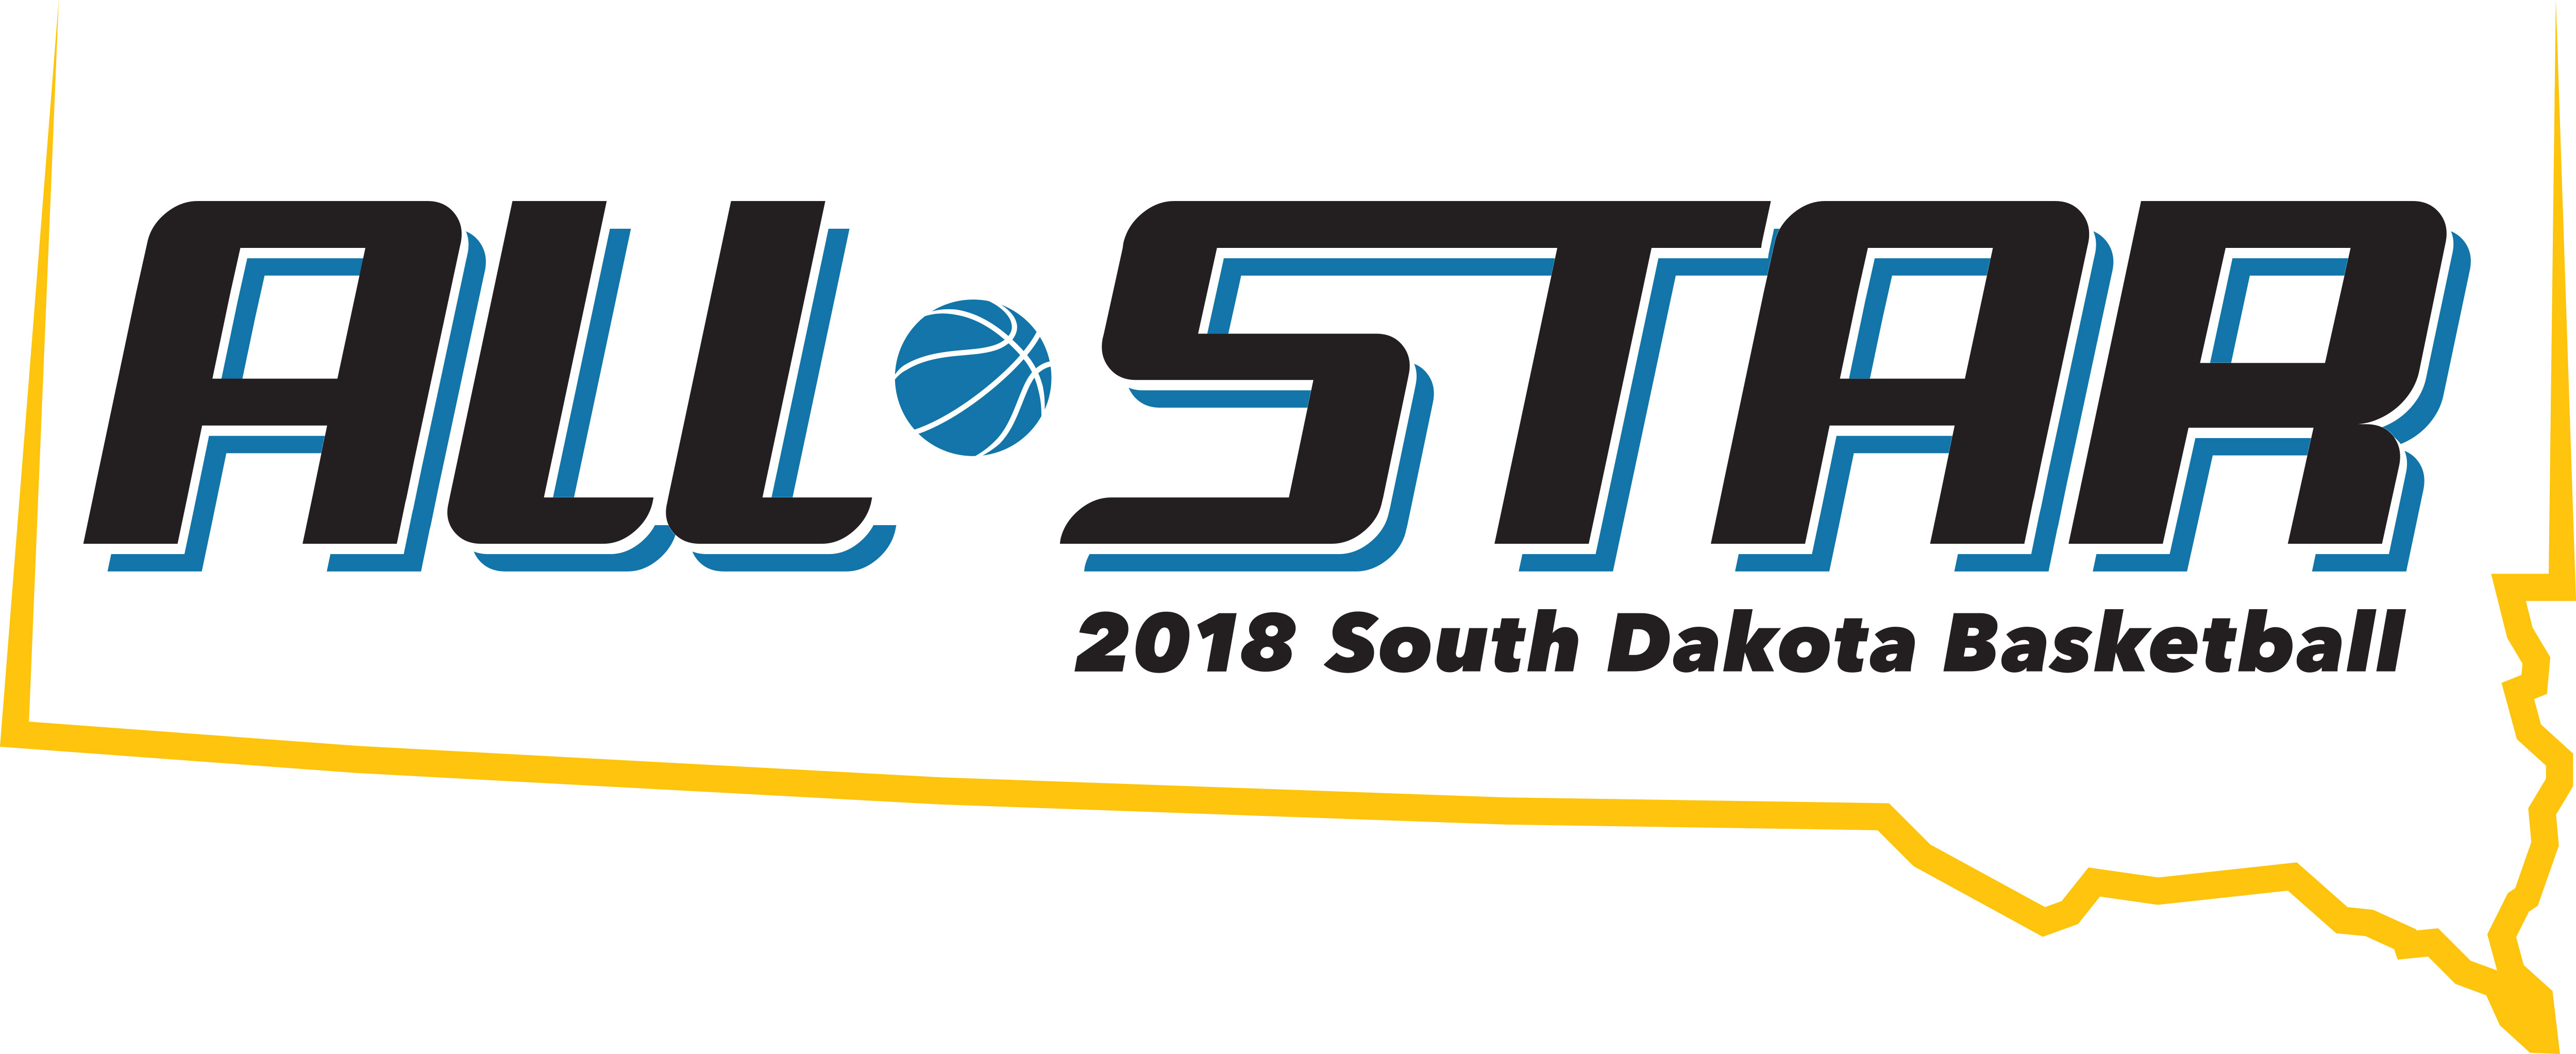 All Star basketball 2018